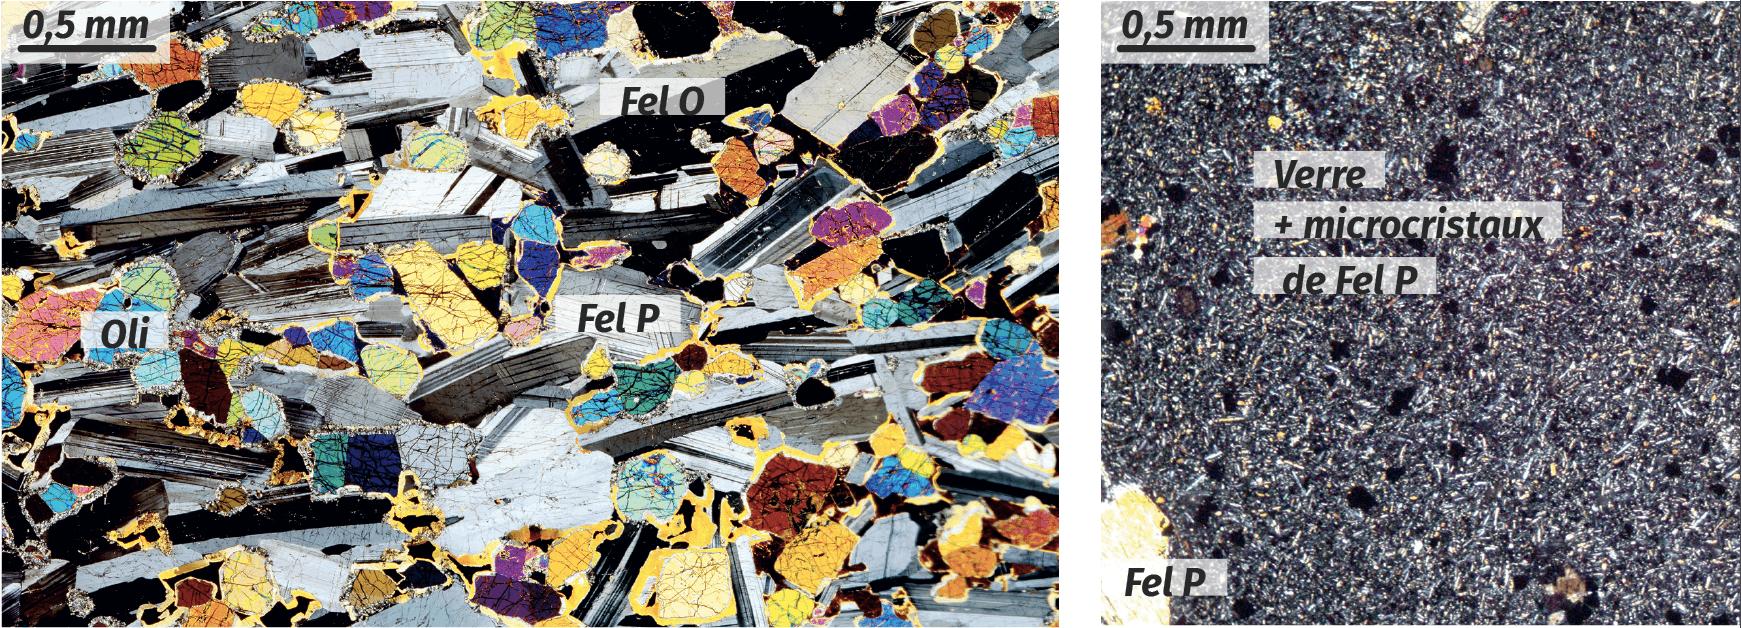 Photographies de gabbro et de basalte